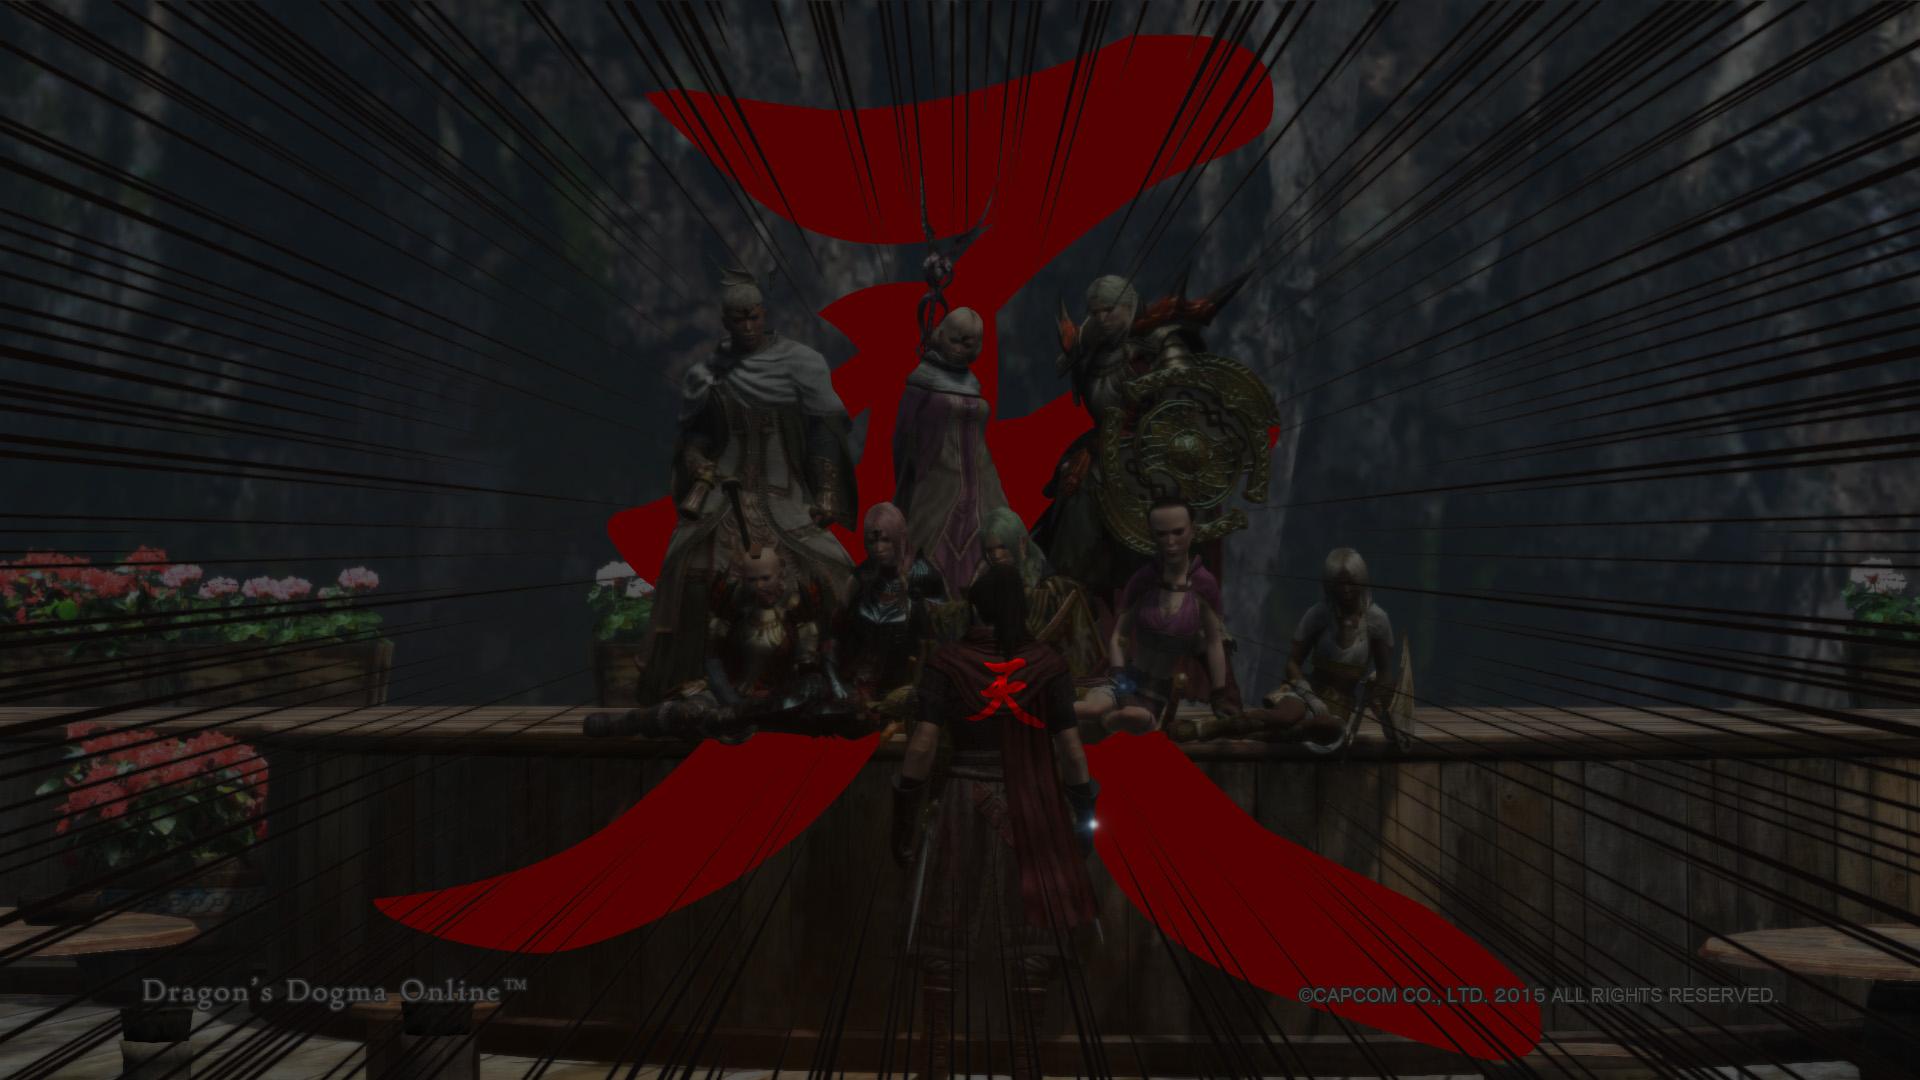 DragonsDogmaOnline_146151253.jpg